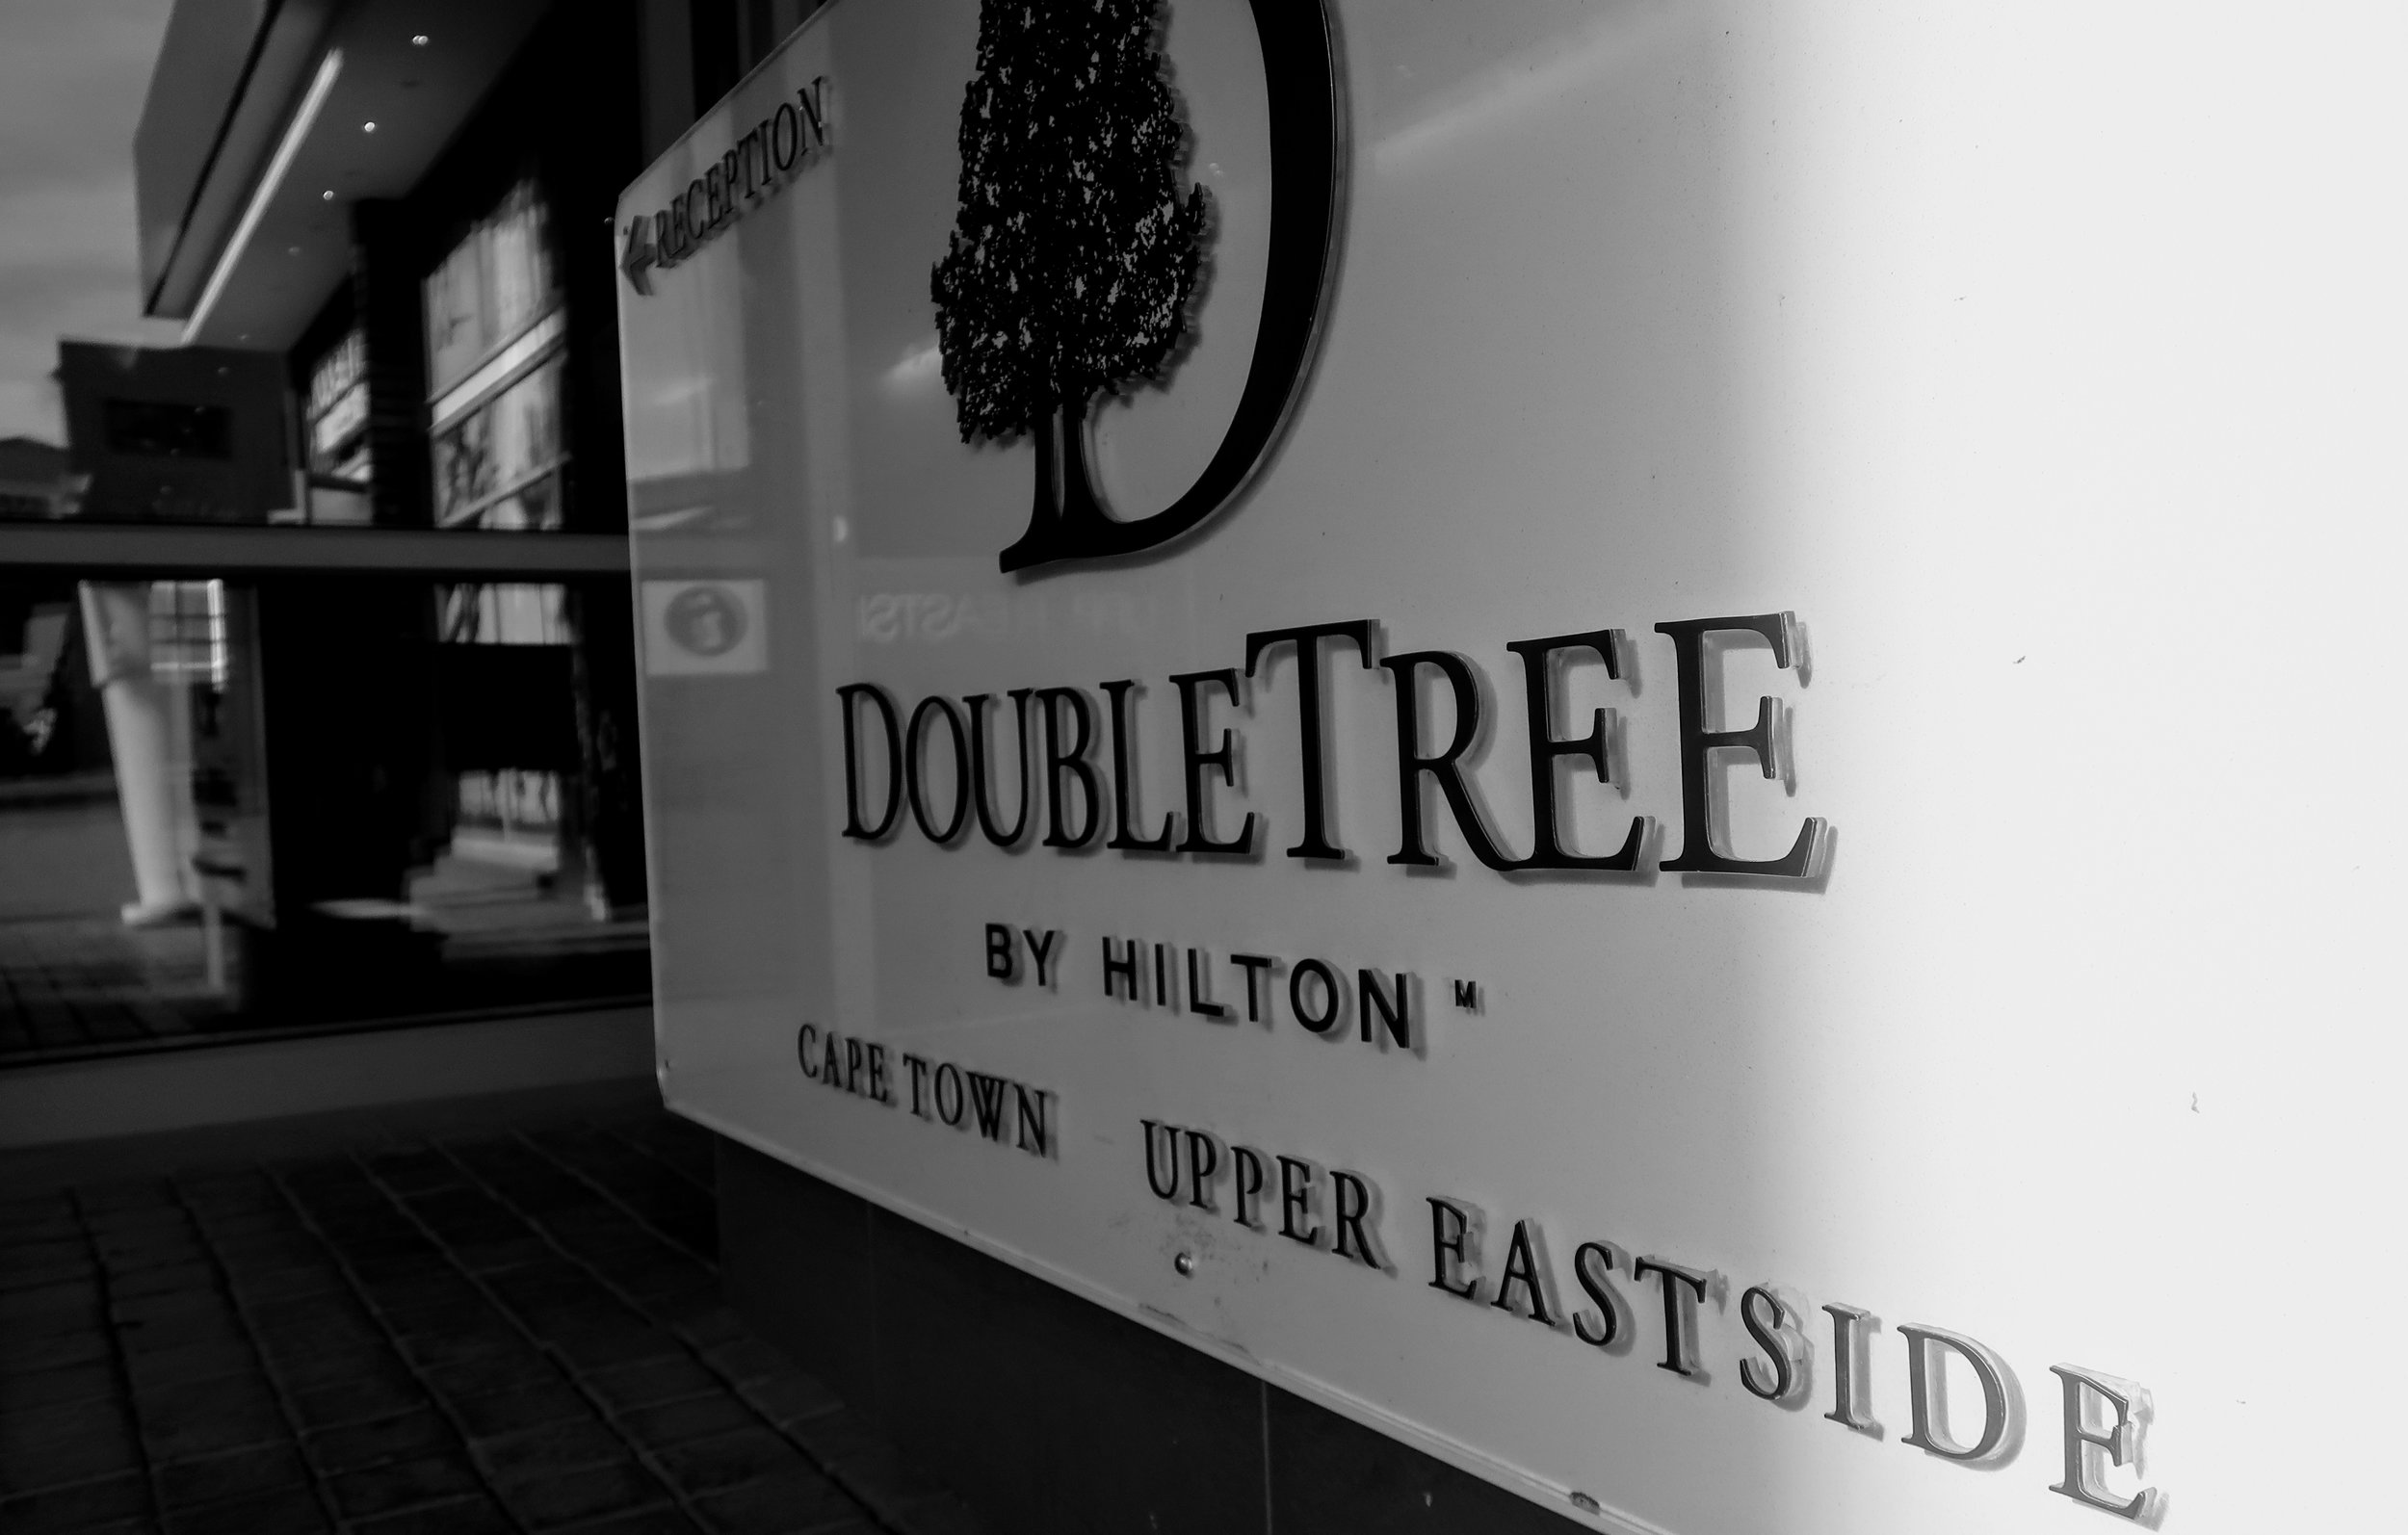 doubletree-hilton-cape-town-bell-desk